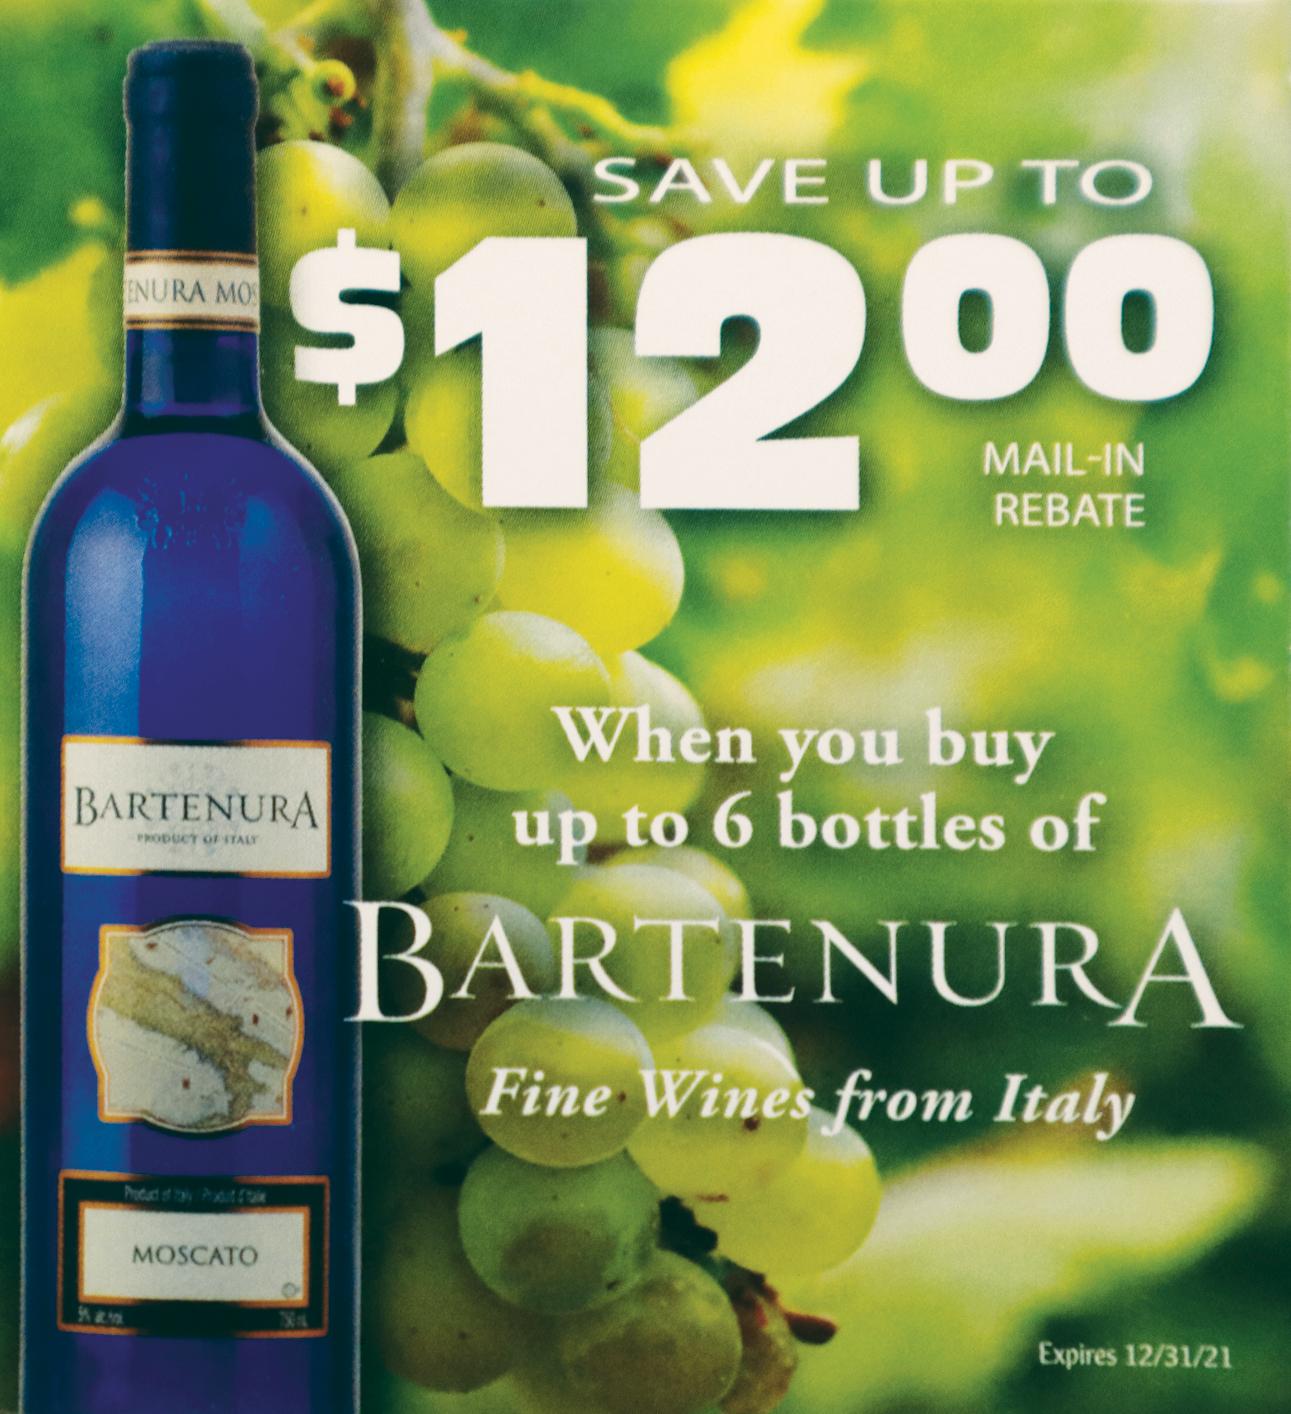 Bartenura Wines